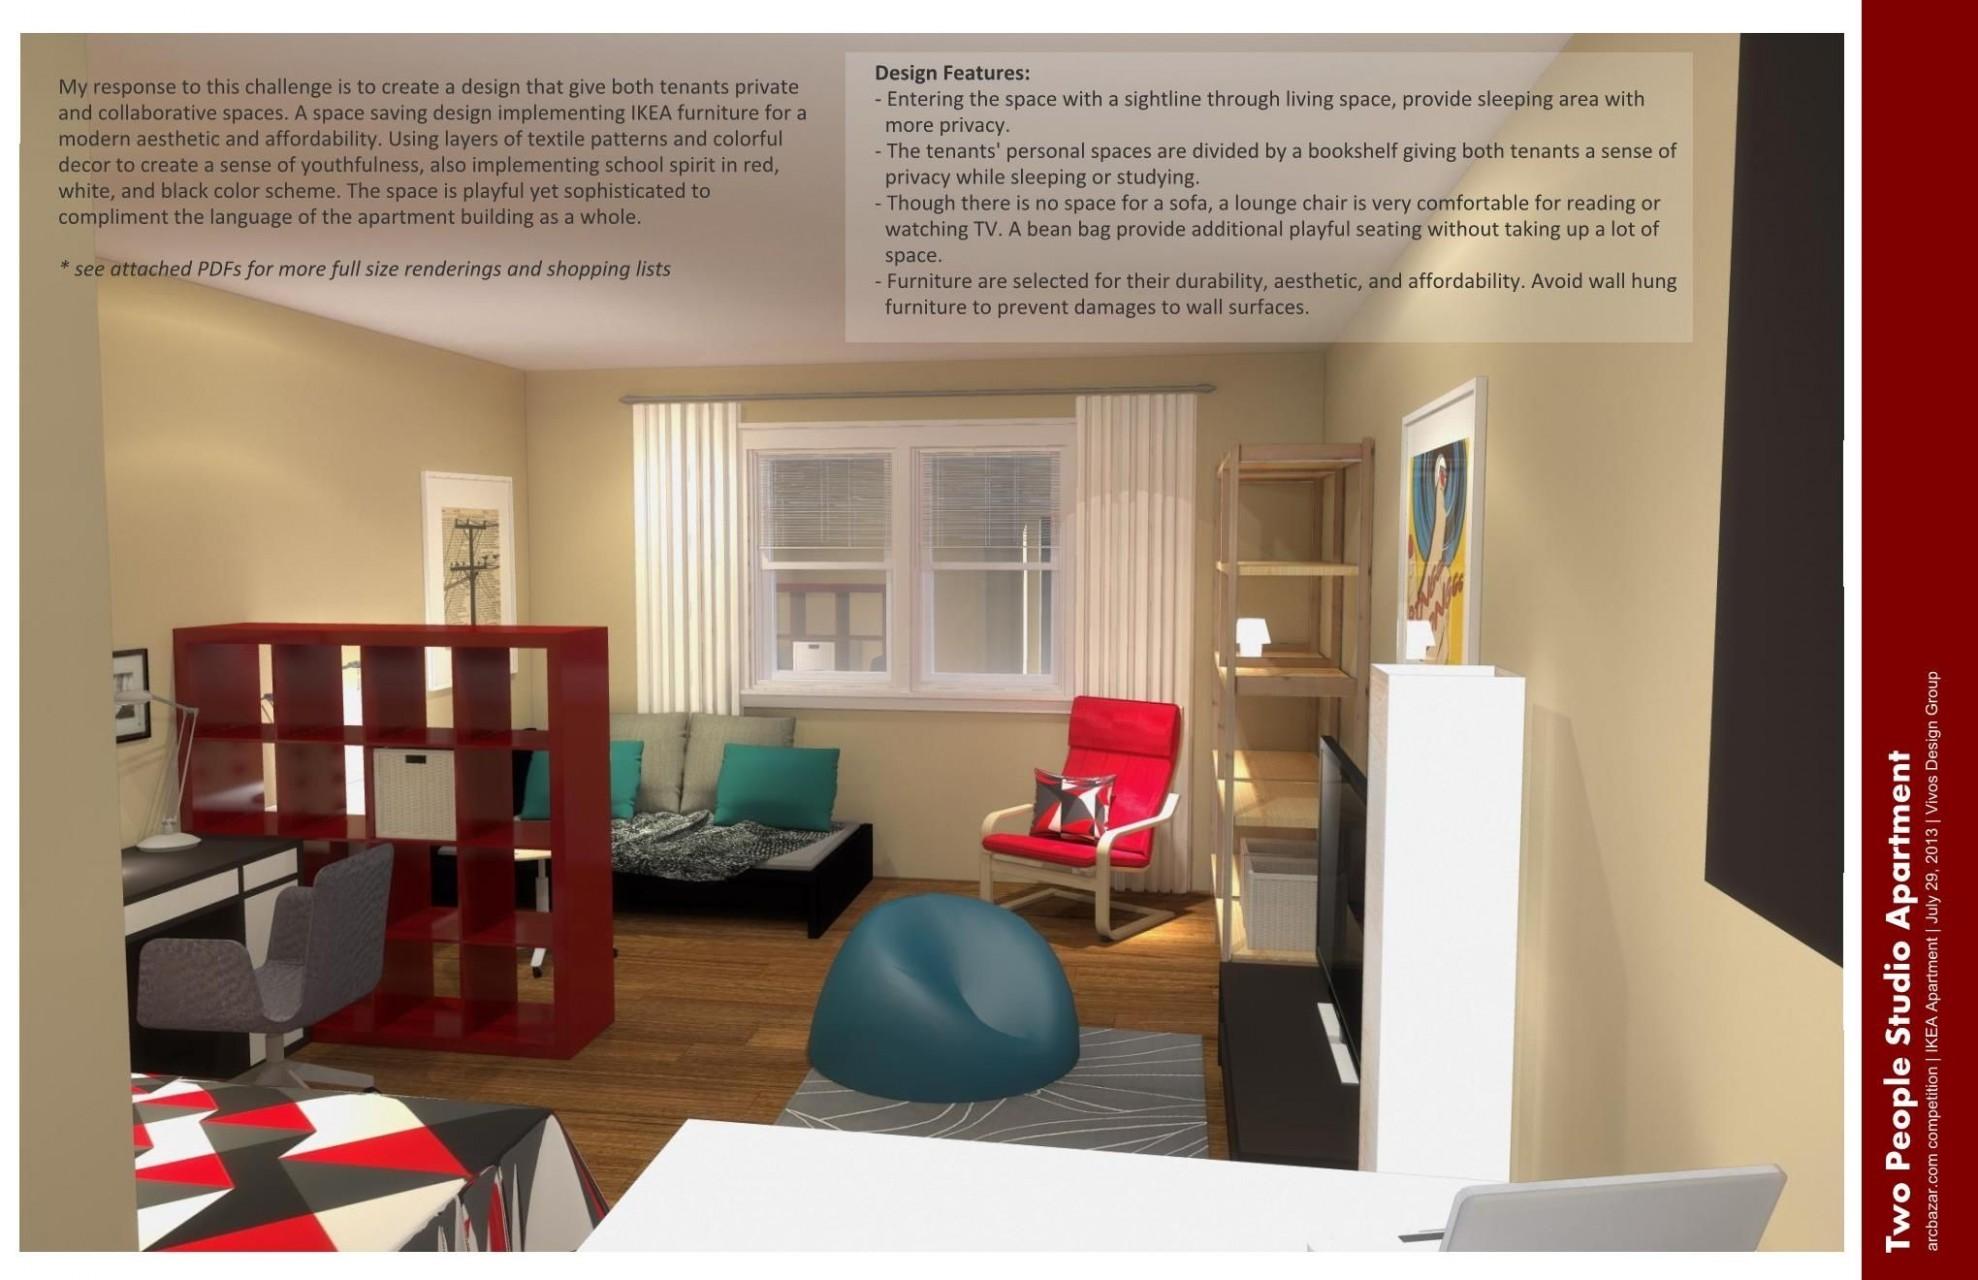 IKEA Studio Apartment Design Ideas  apartment bedroom : Small  - Small Apartment Decorating Ideas Ikea